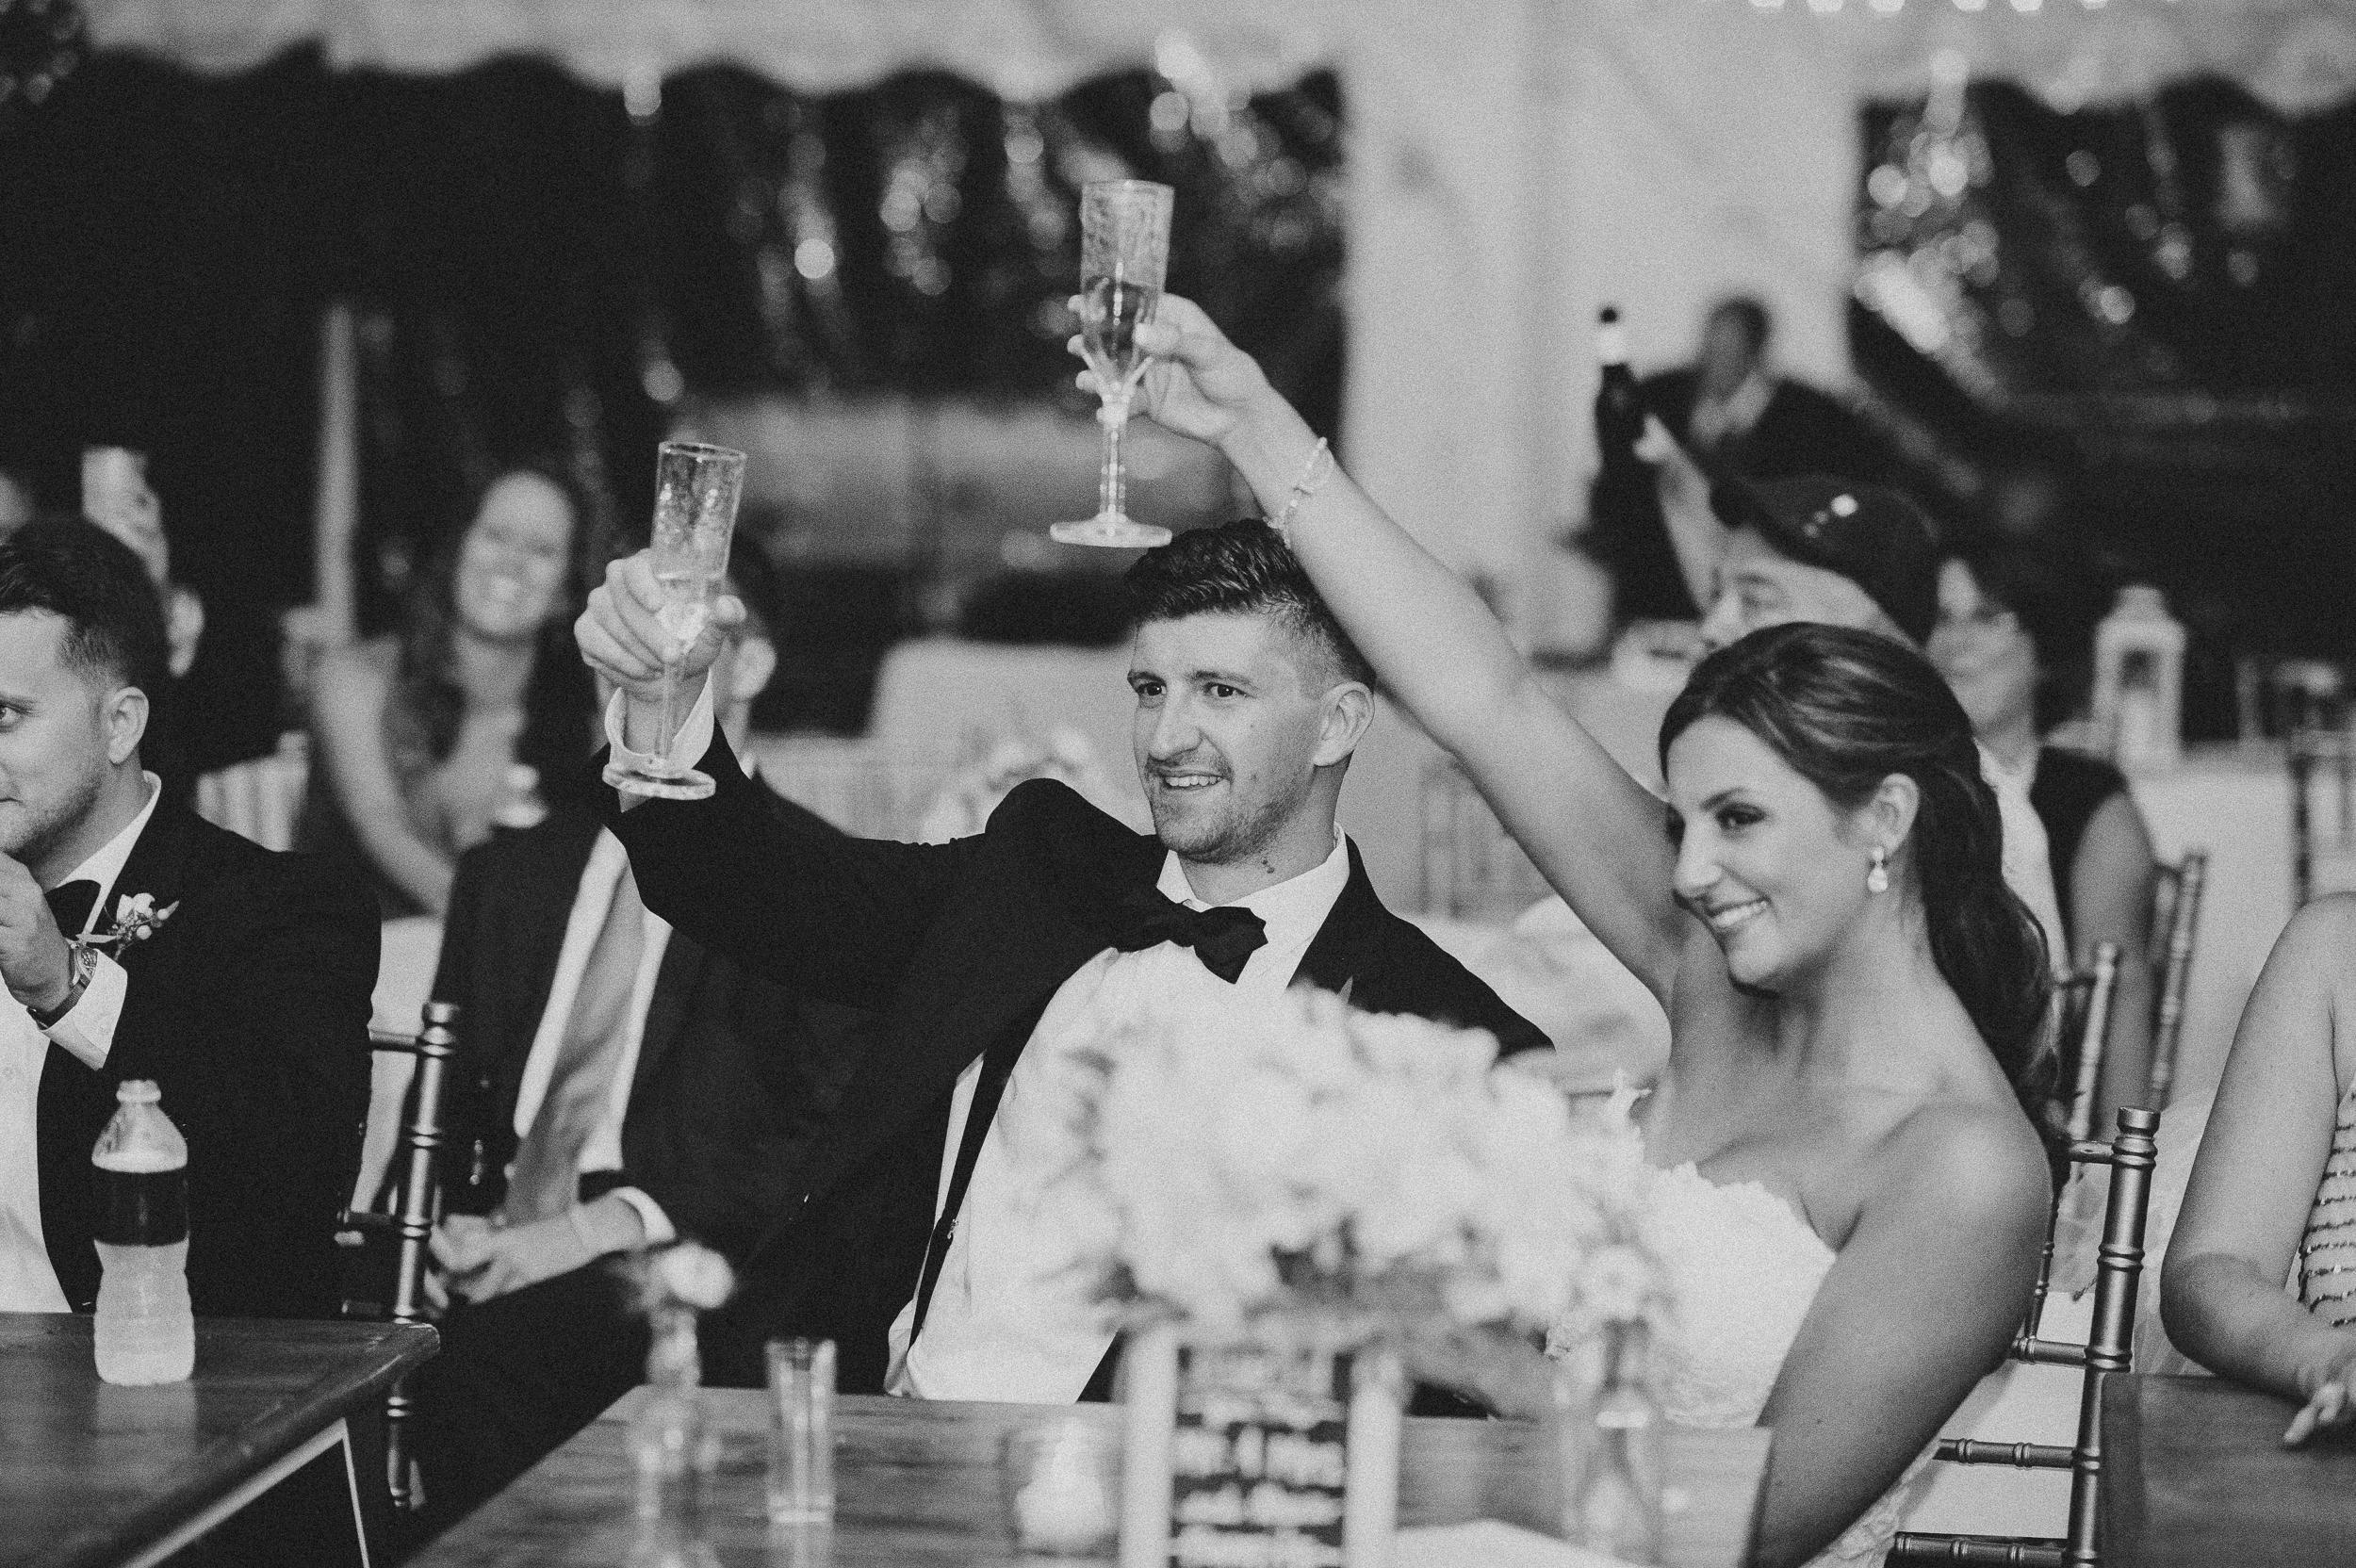 delaware-estate-wedding-photographer-pat-robinson-photography-118.jpg